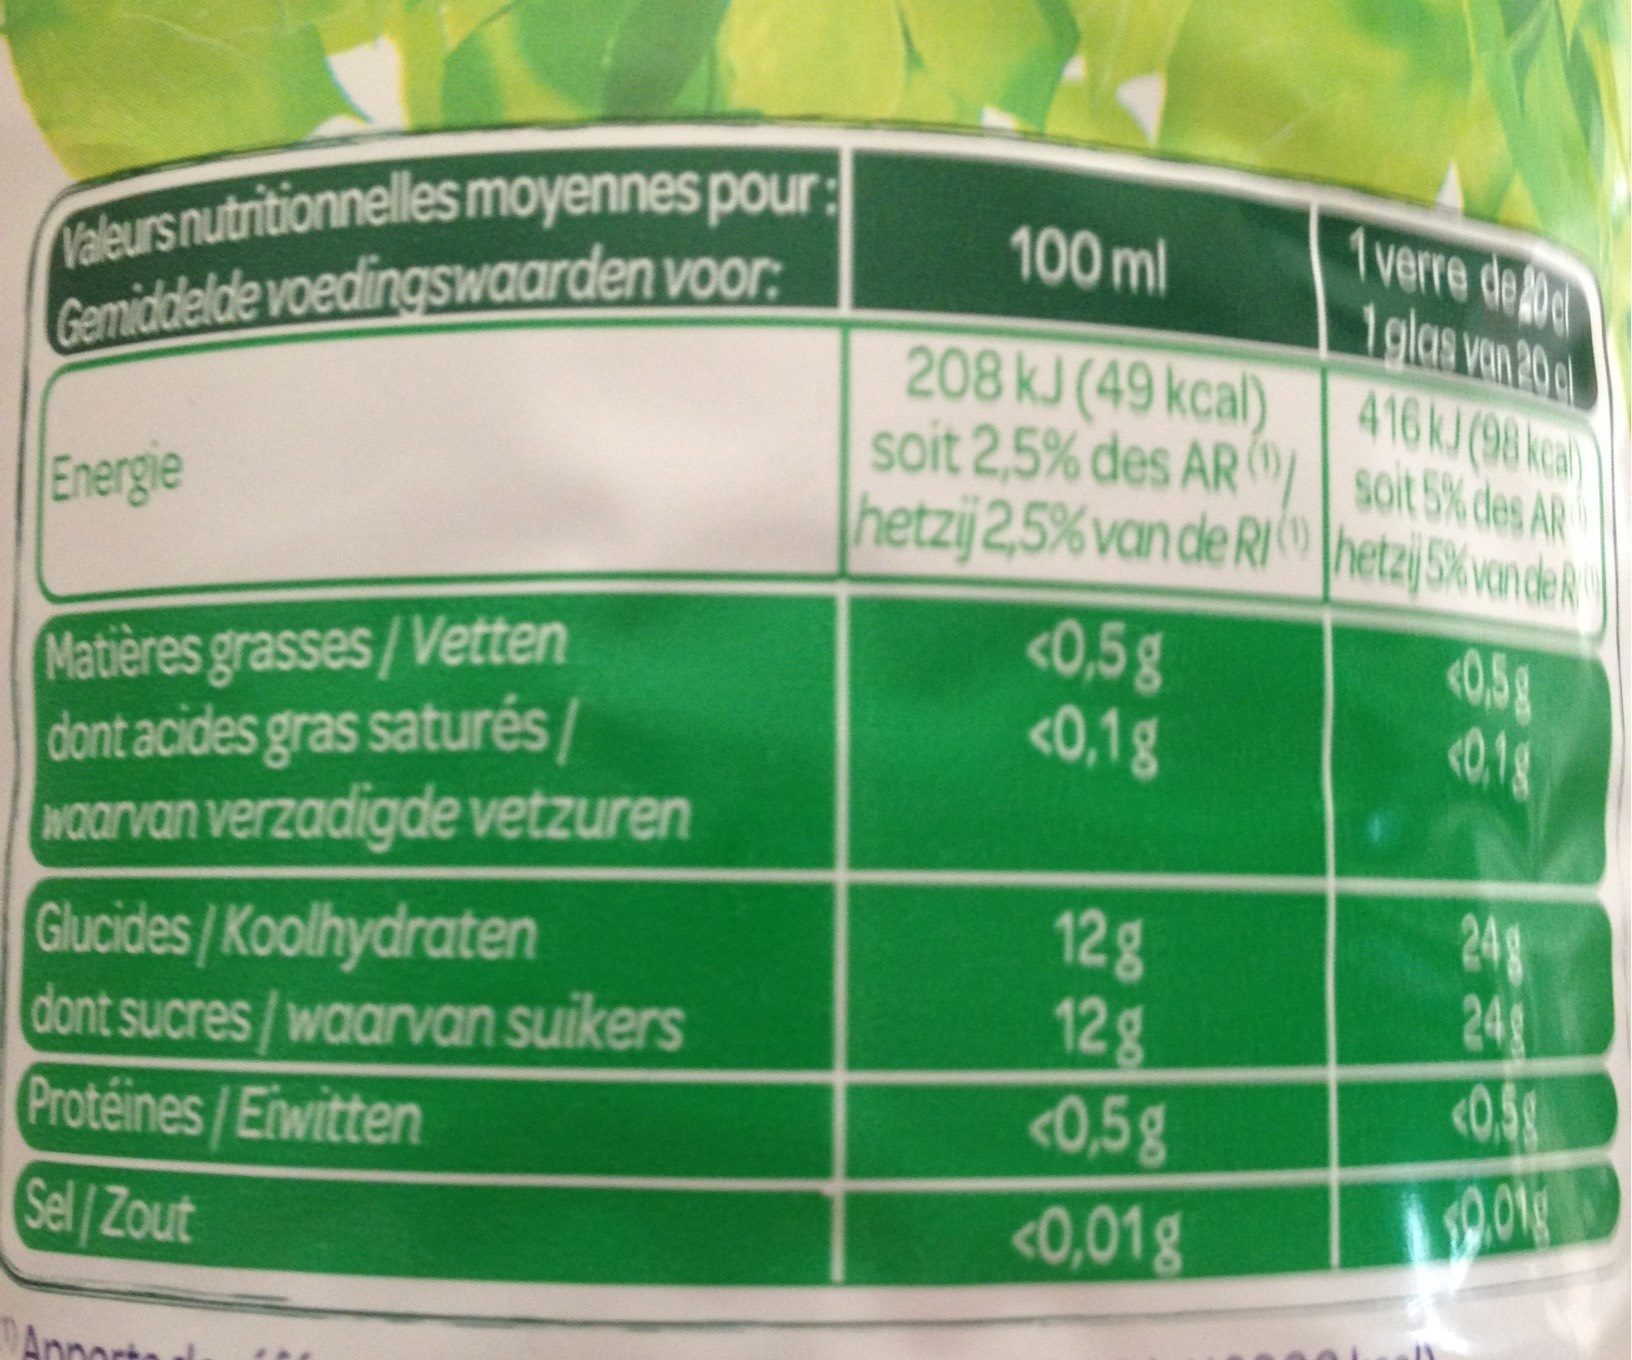 100% Pur Jus MultifruitsJus de 7 fruits - Nutrition facts